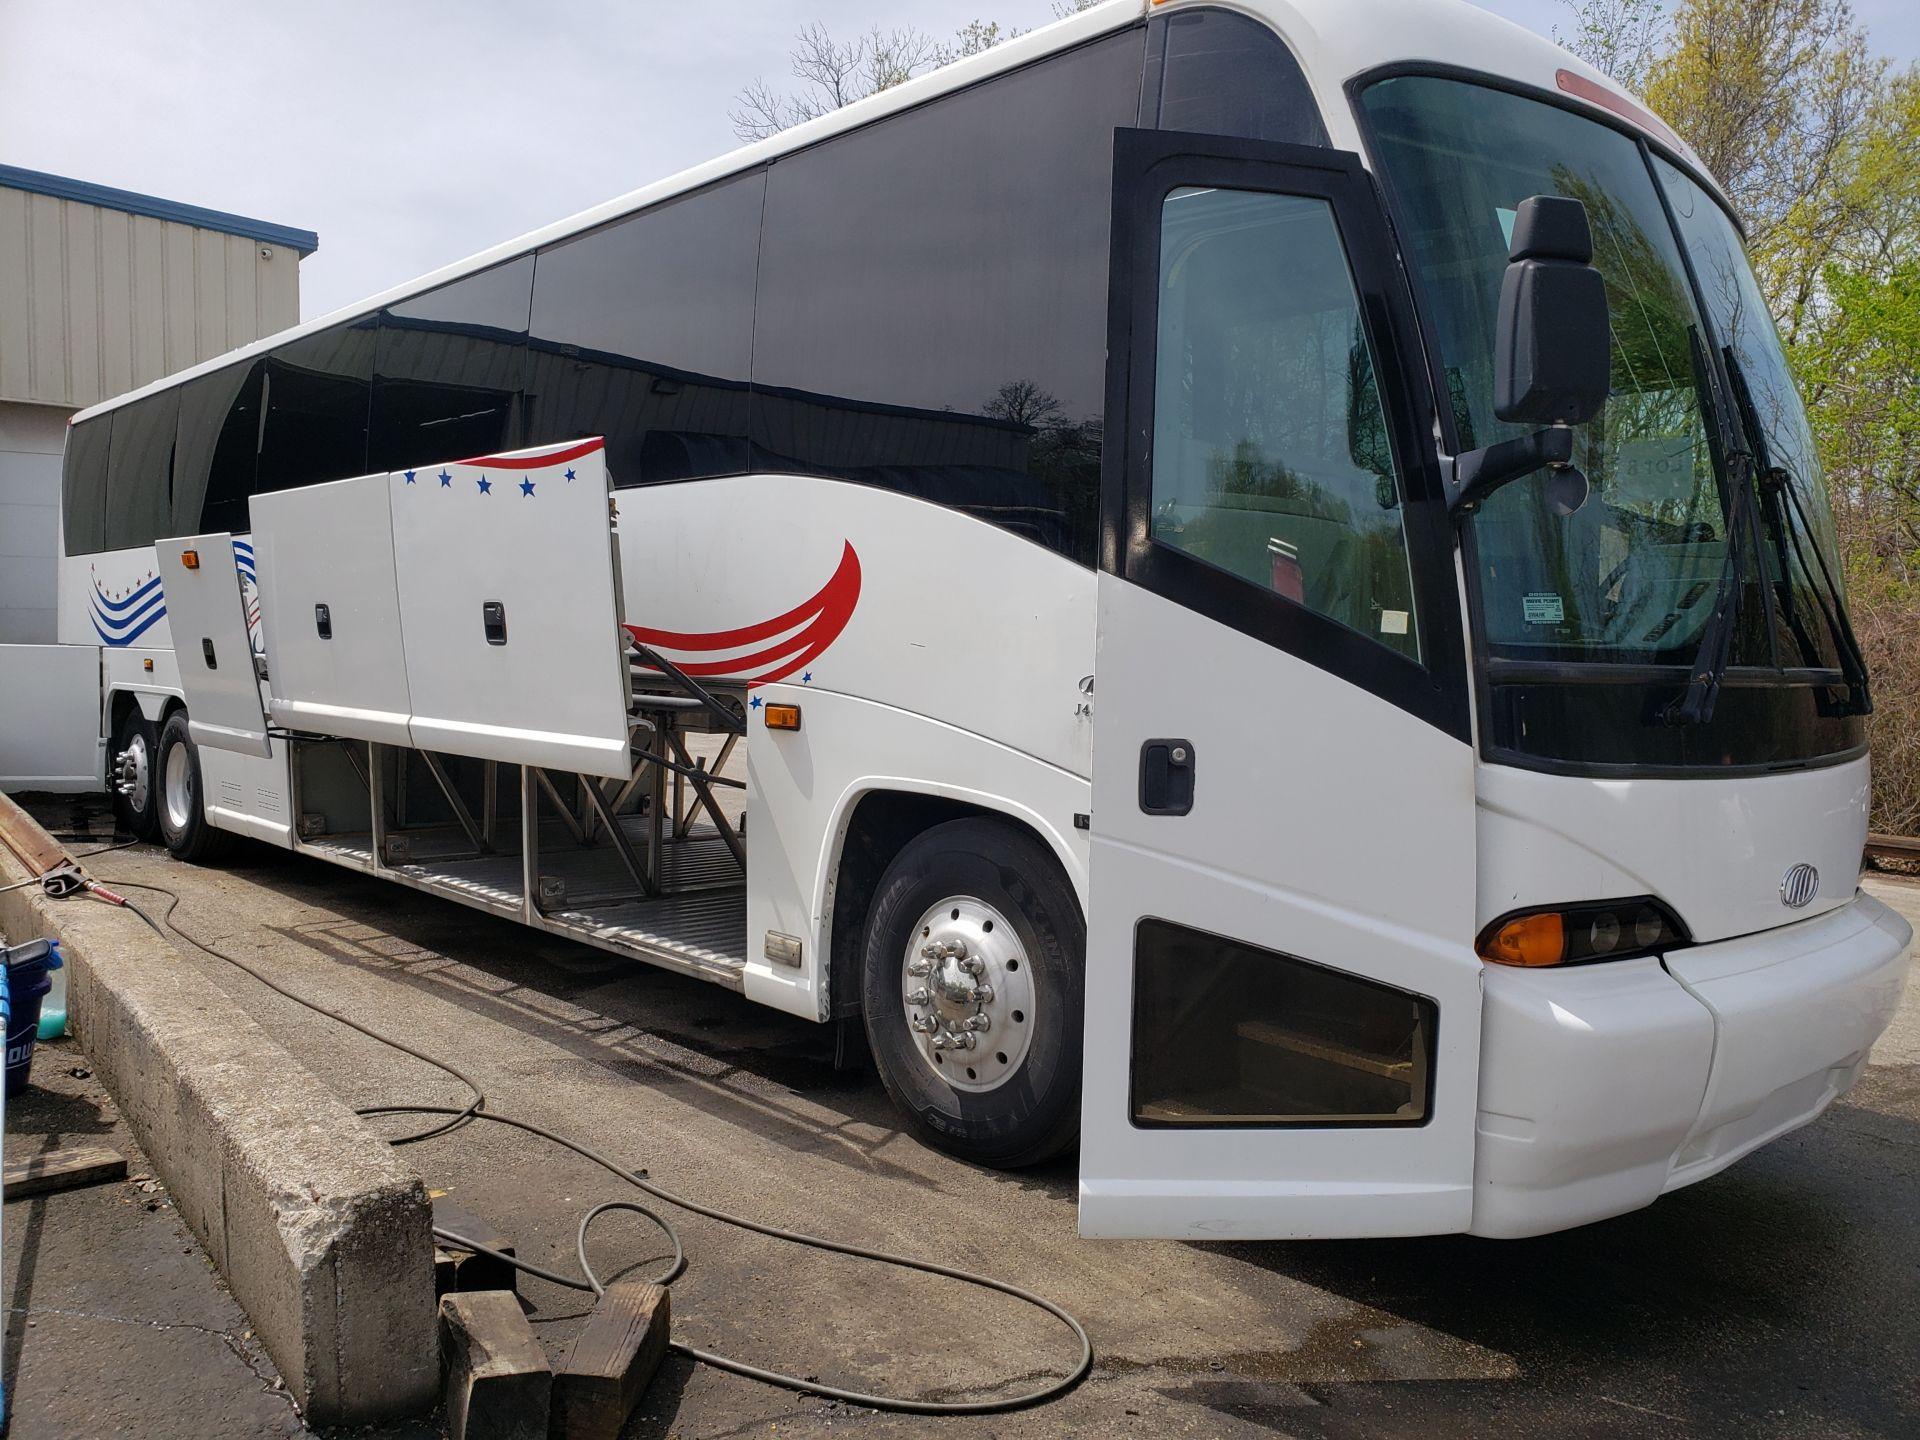 2005 MCI J4500 56-Pass Kneeling Coach Bus - Image 5 of 20